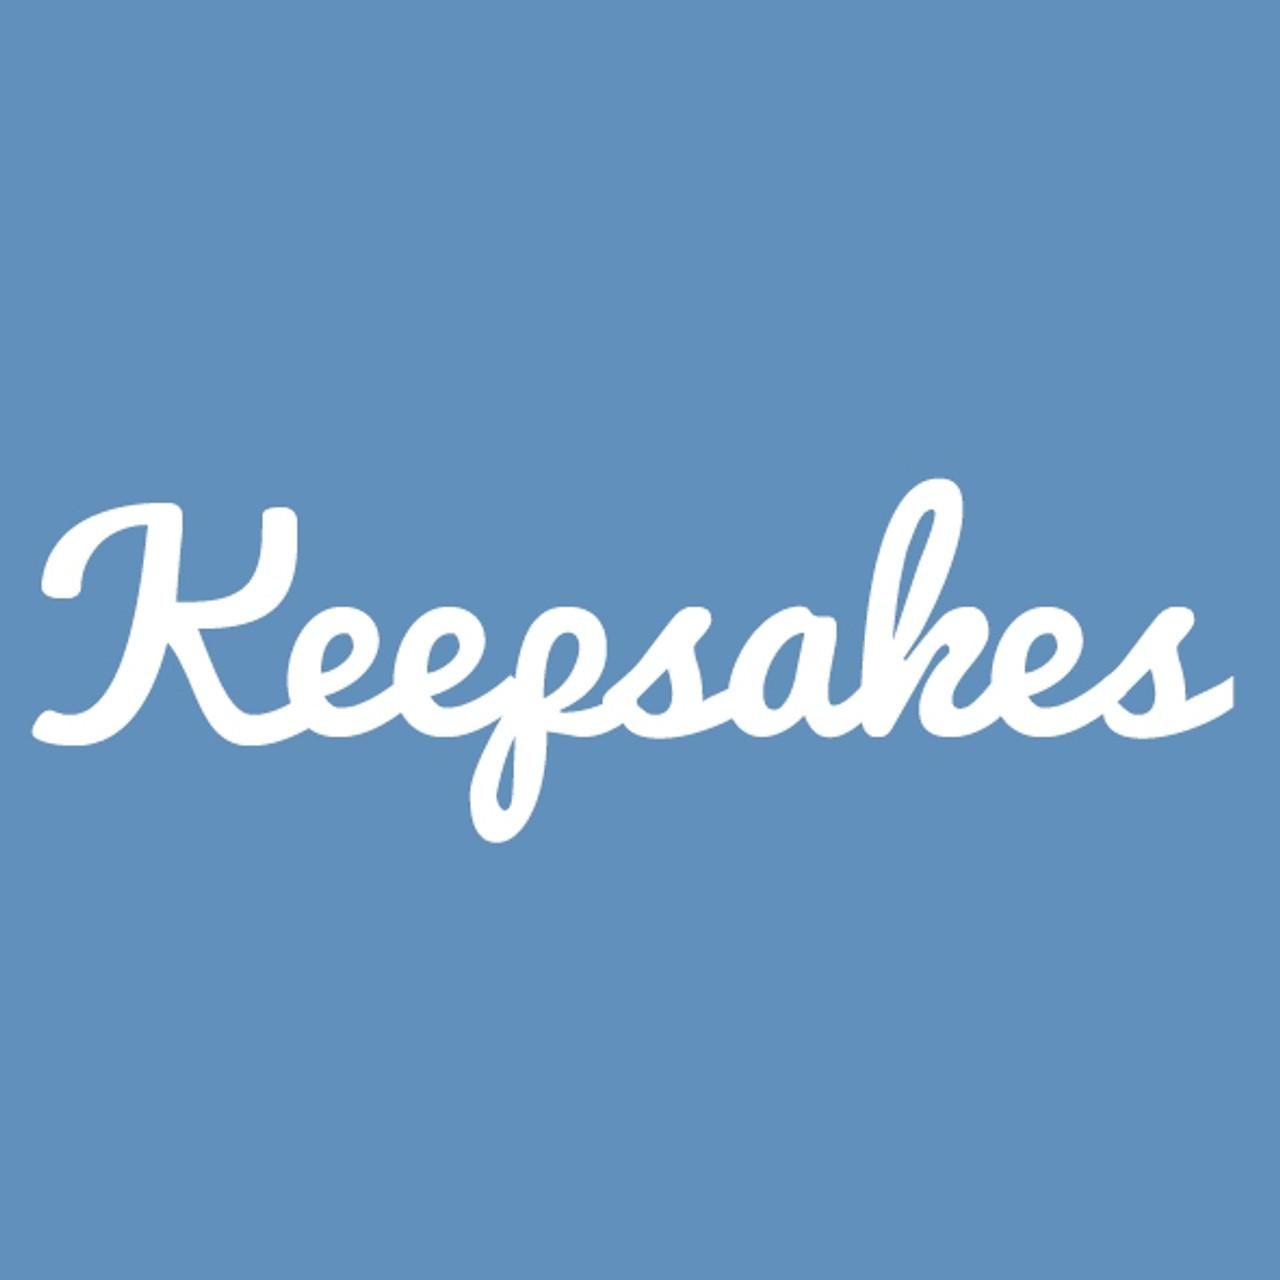 40th Birthday Keepsakes